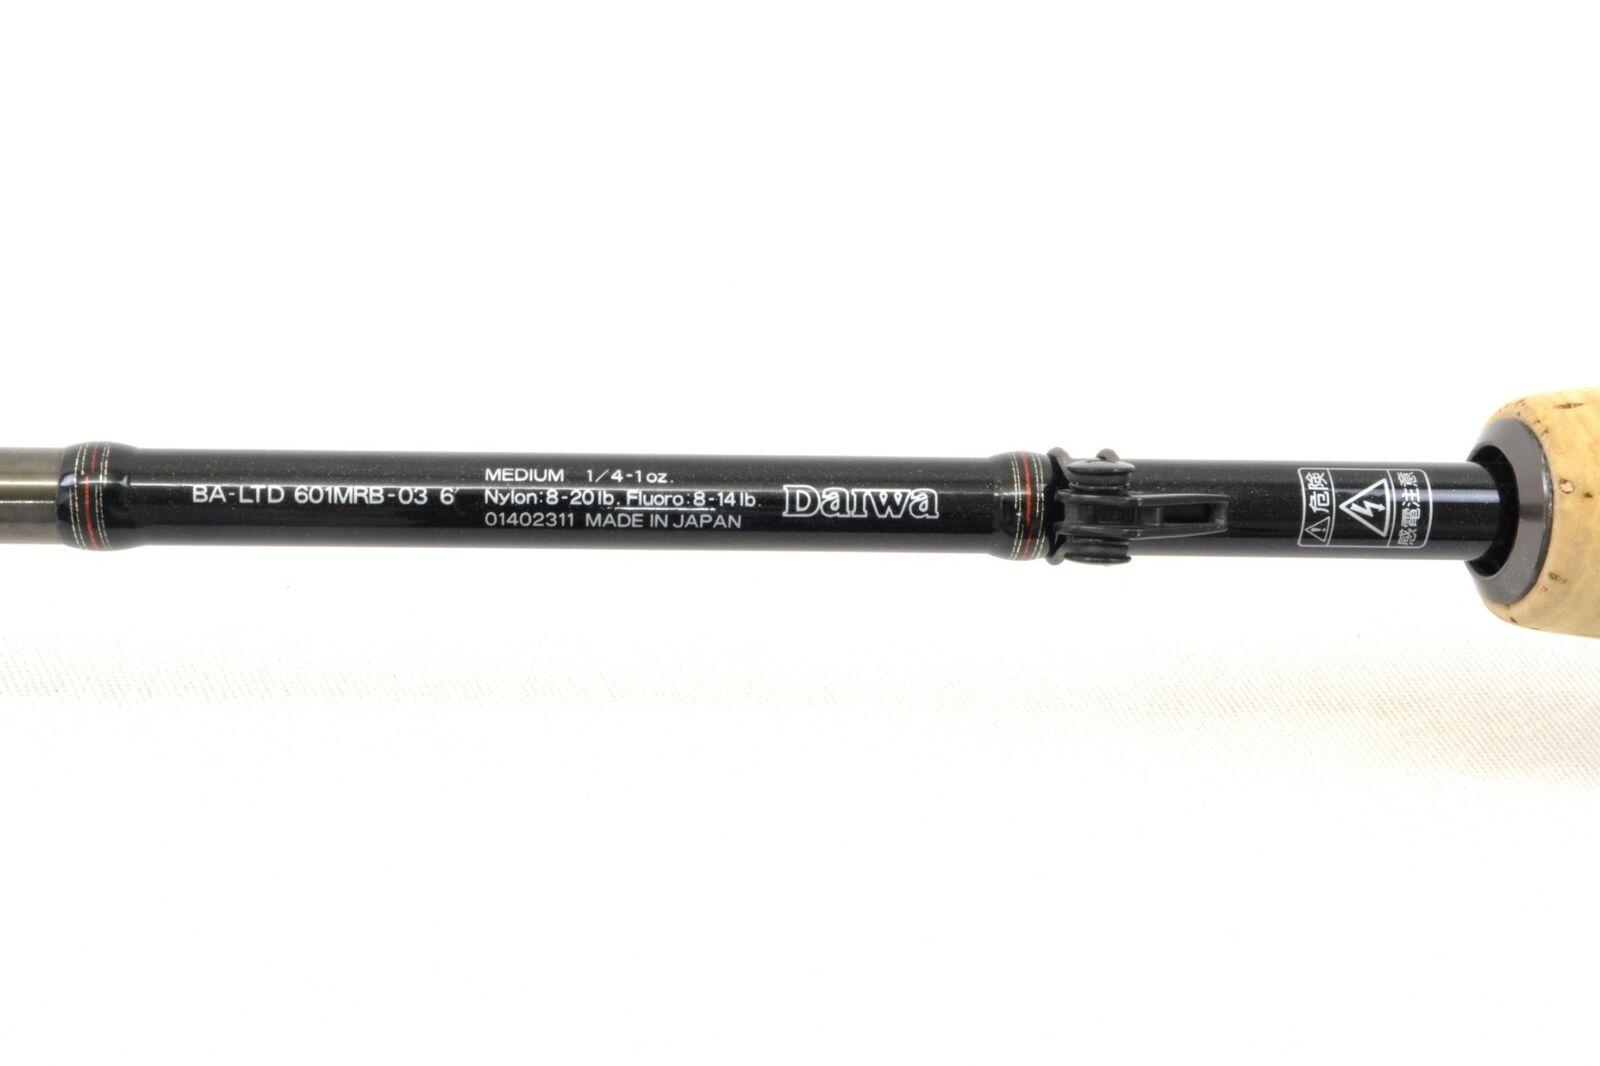 Usado Battler Limited Ba-Limited 601MRB-03 Raptor limitada Casting Rod F S de Japón 891